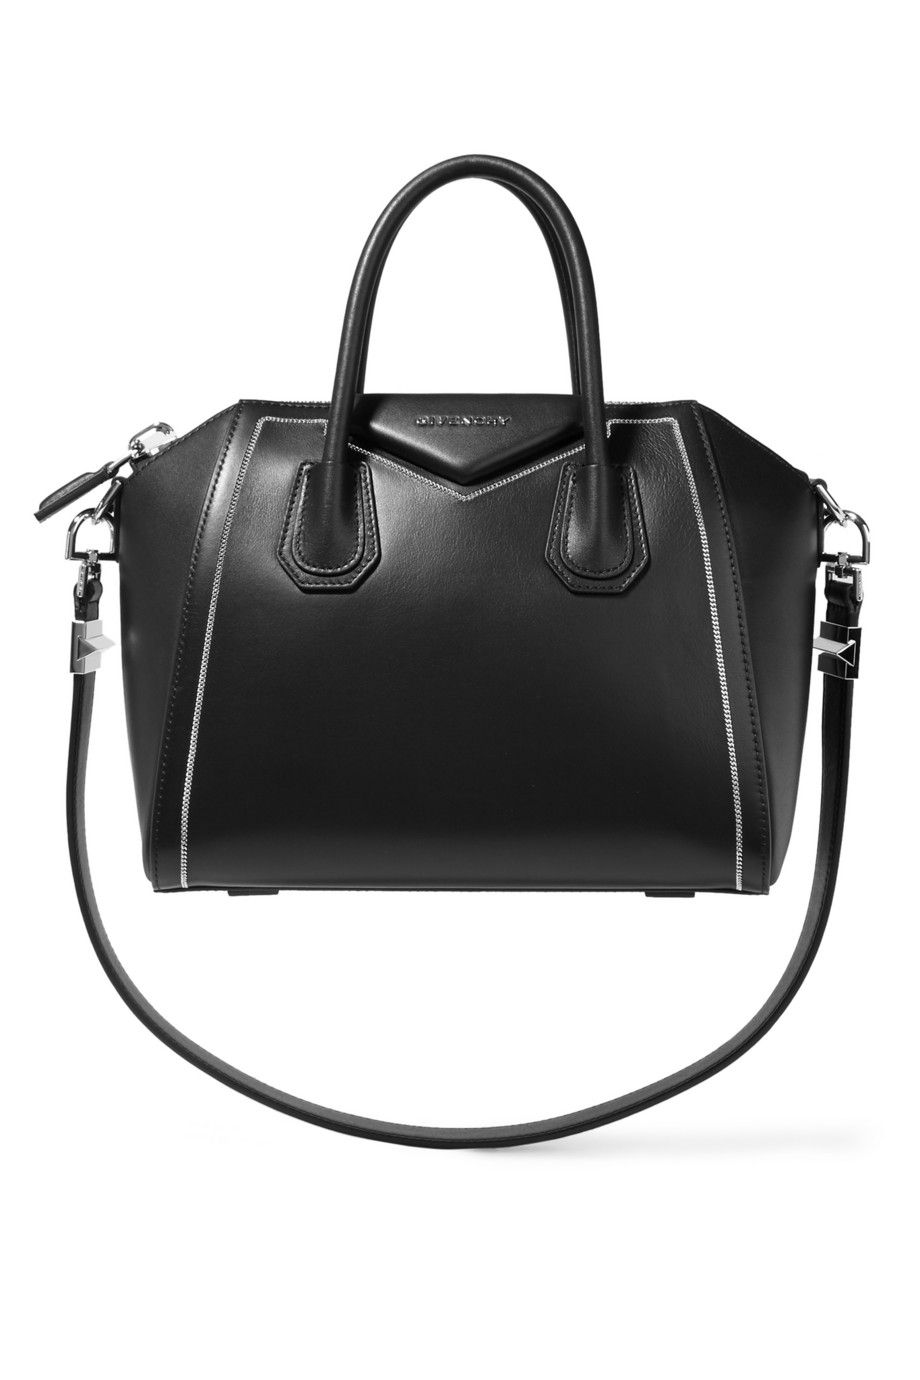 Petit Noir A Antigona GivenchySac En Net Cuir Modèle 5jqL3A4R